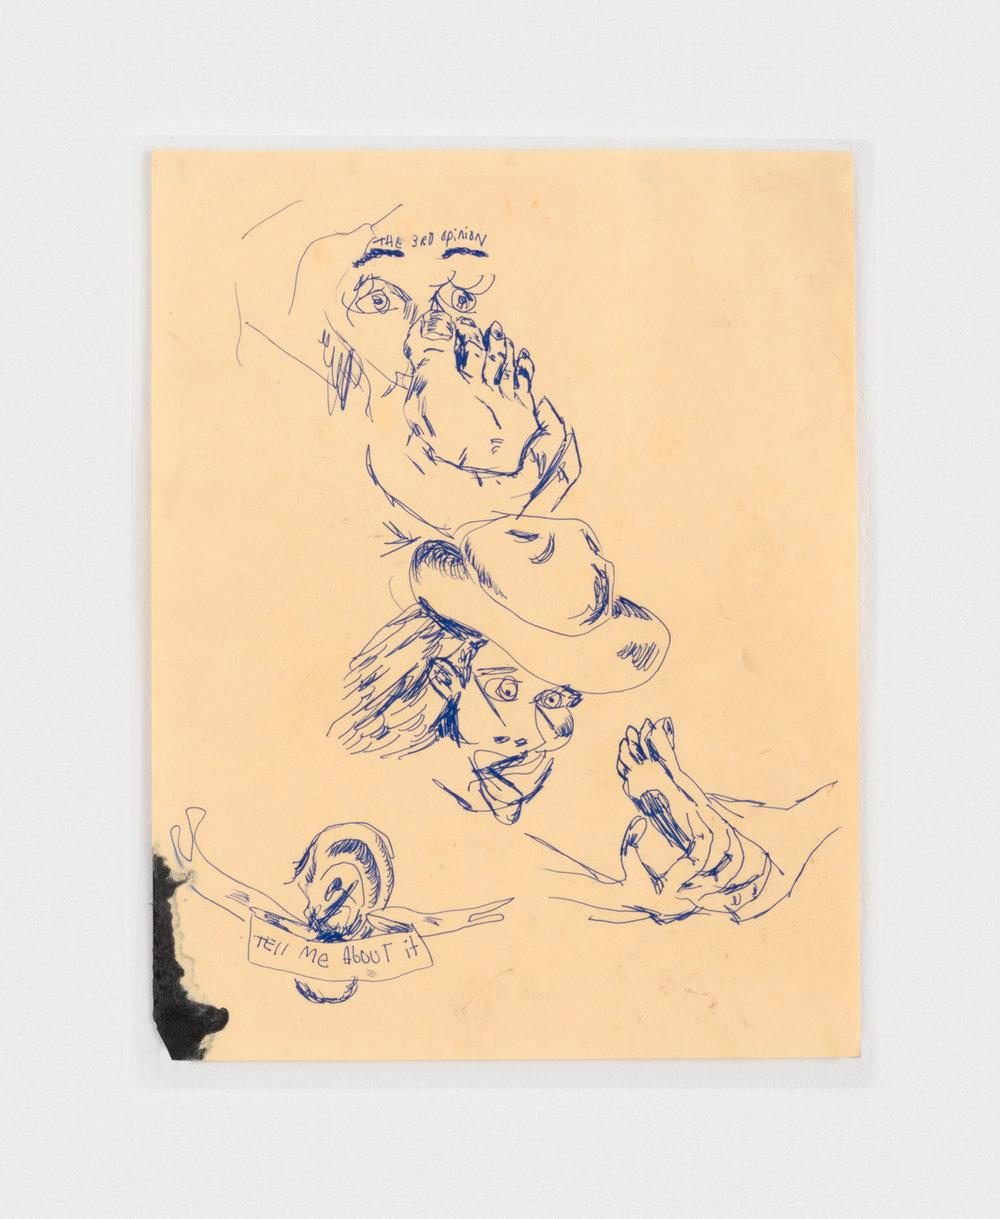 Alex Becerra Foot Rub 2016 Ink on paper (laminated) 11 x 8 1/2 in (27.94h x 21.59w cm) AB156